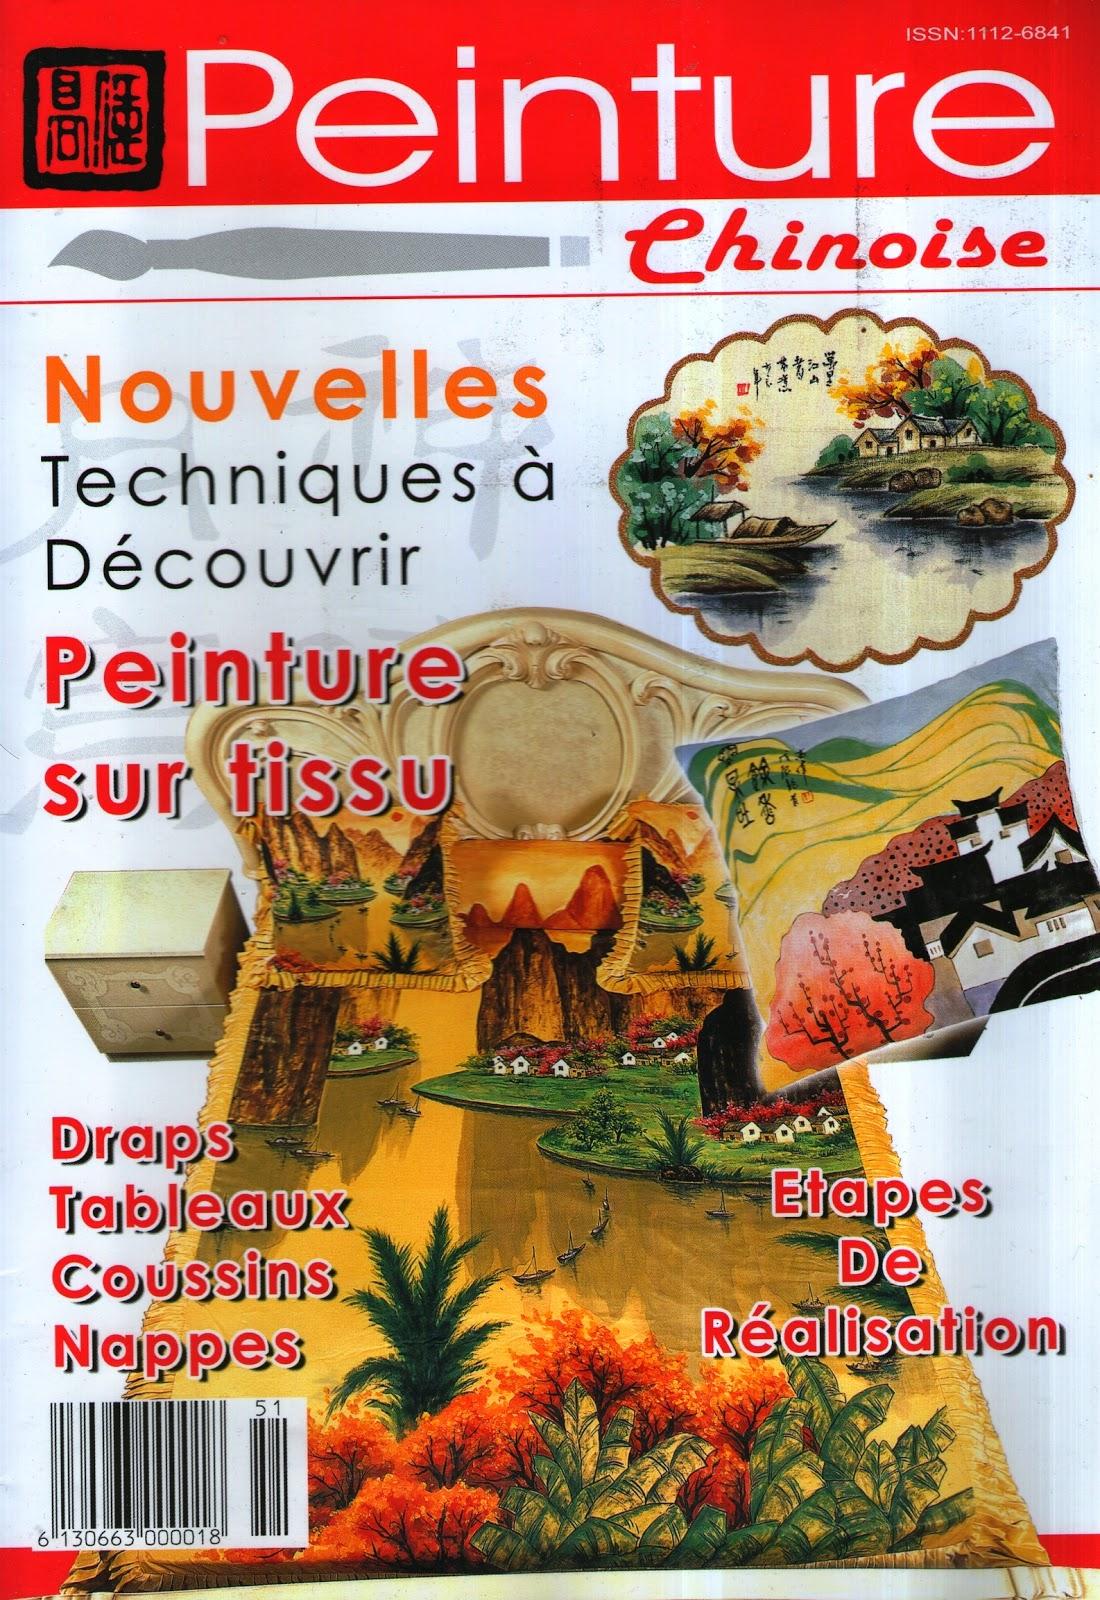 كتاب اميرة طمود  للتحميلPeinture Chinoise Peinture%20Chinoise%20par%20Amira%20Tamoud